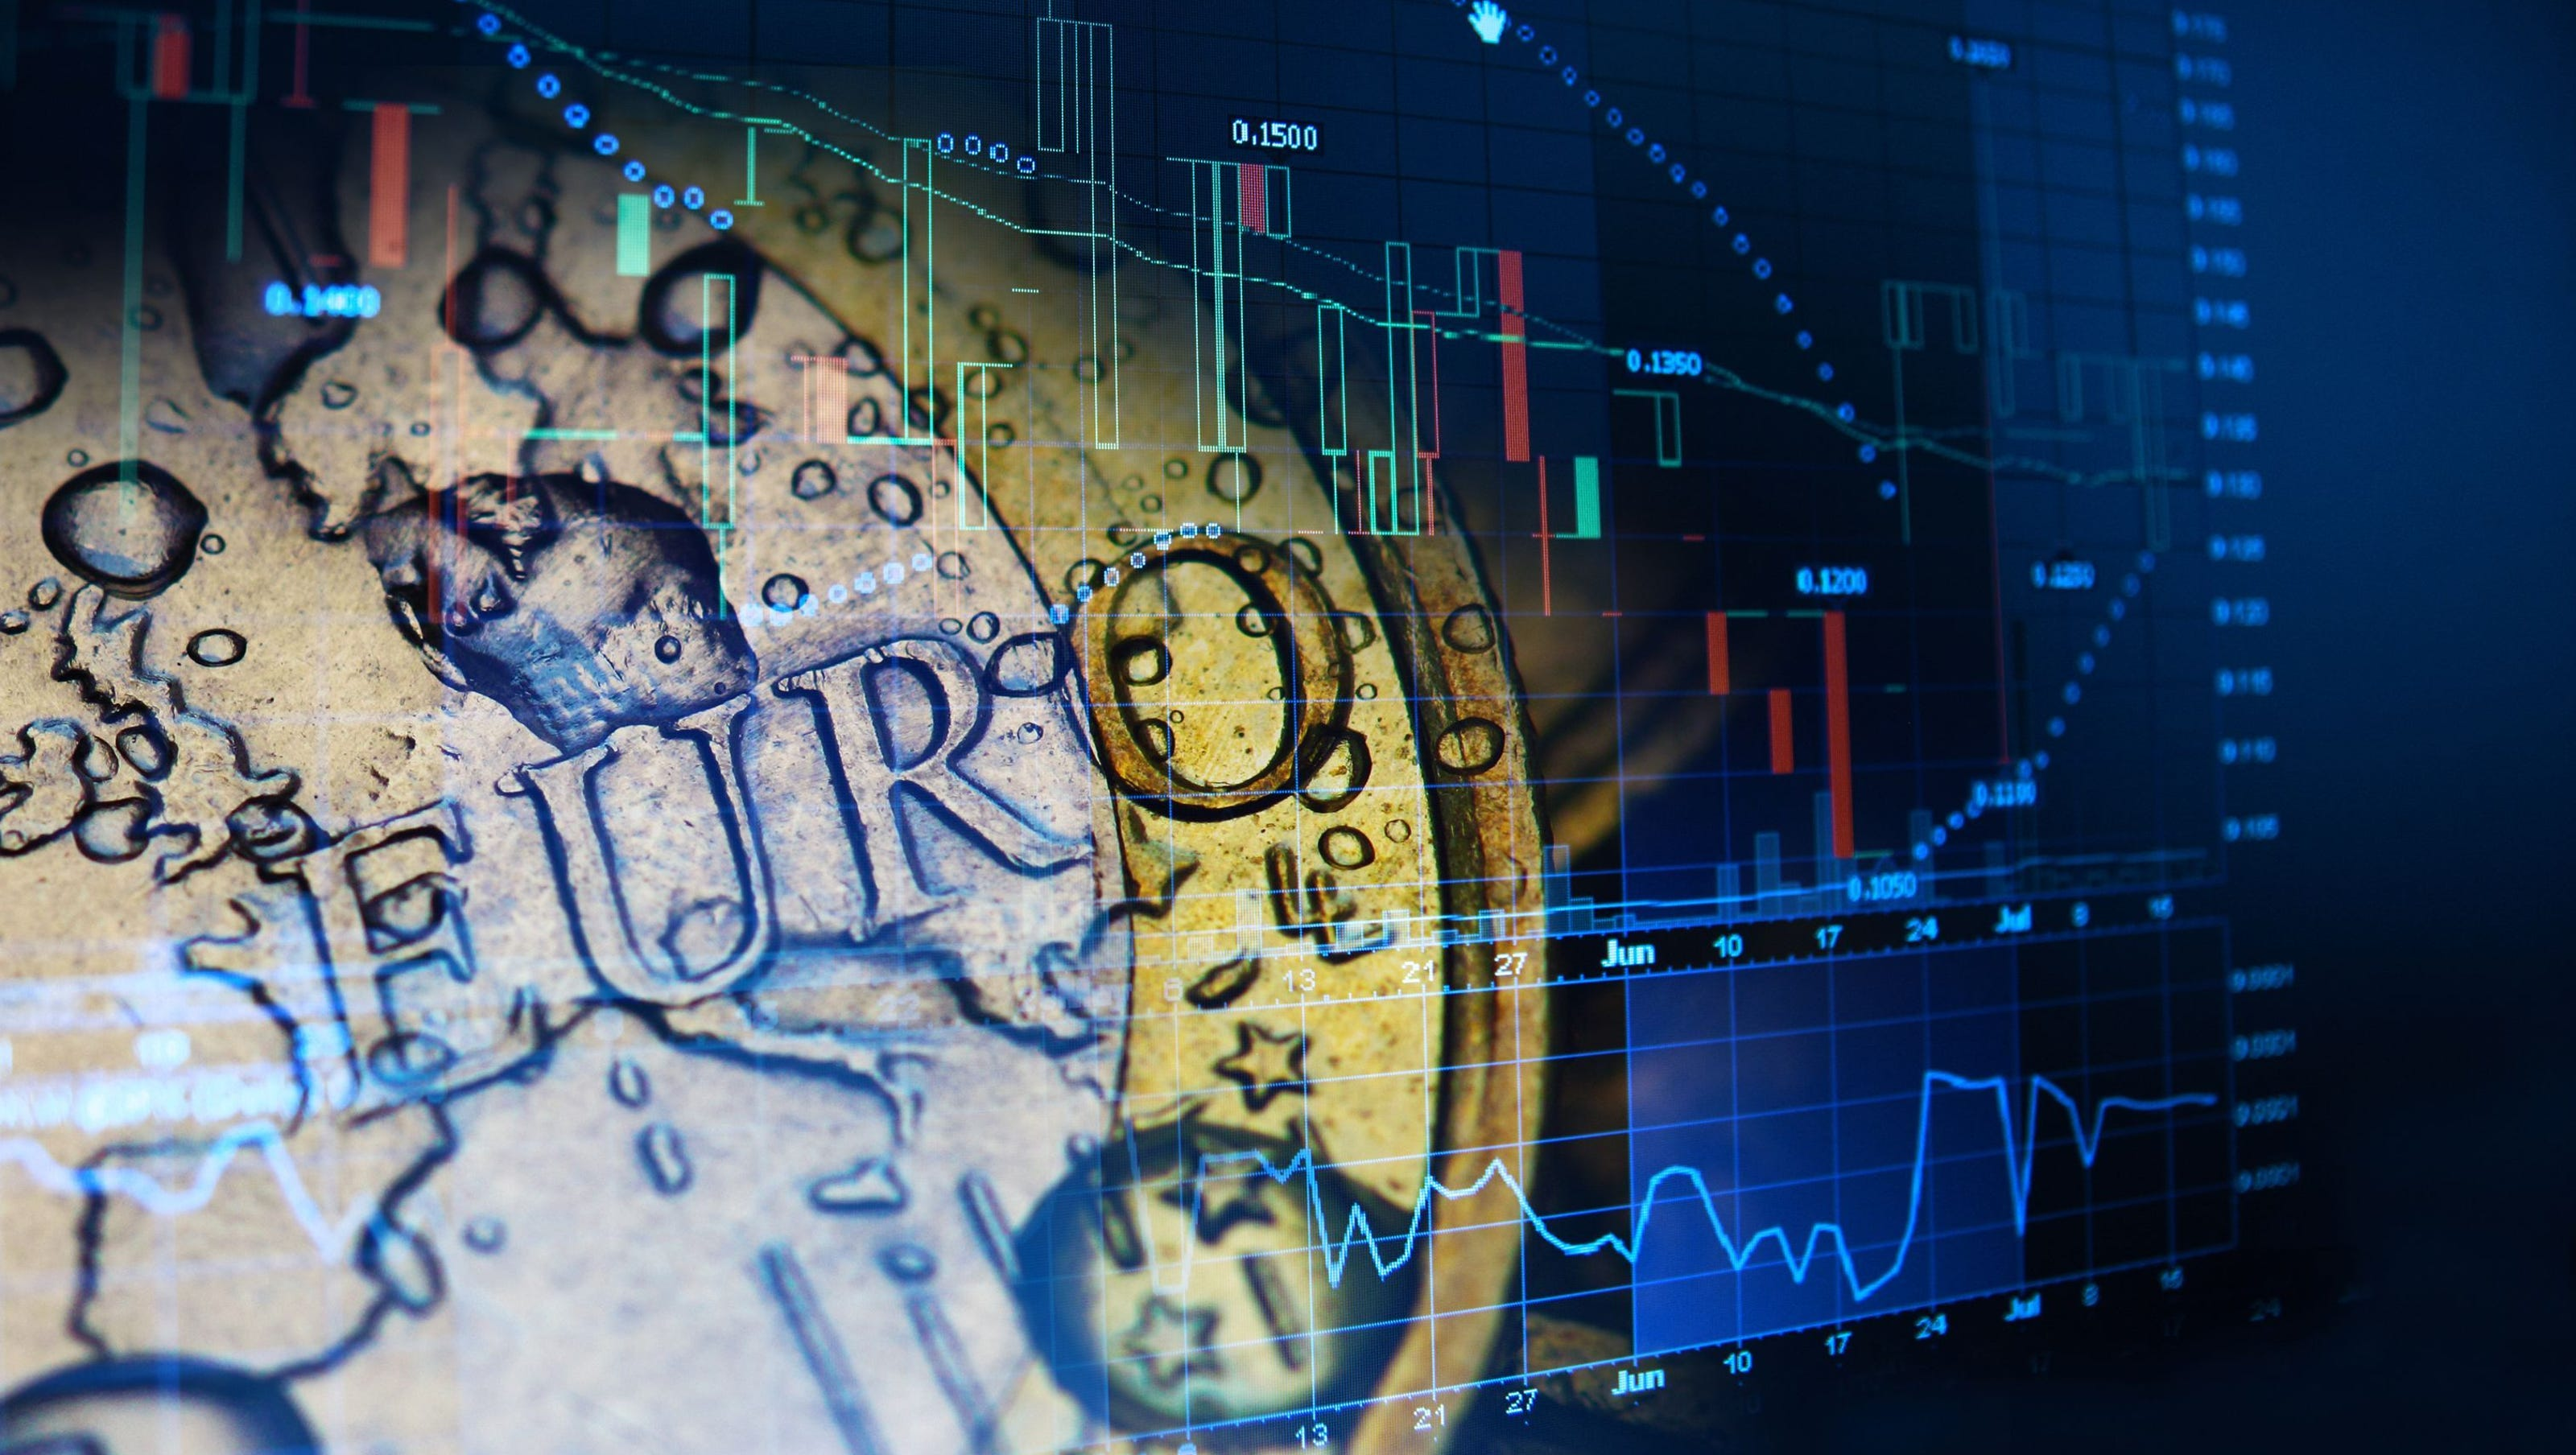 نتيجة بحث الصور عن europe's untapped capital market: rethinking financial integration after the crisis